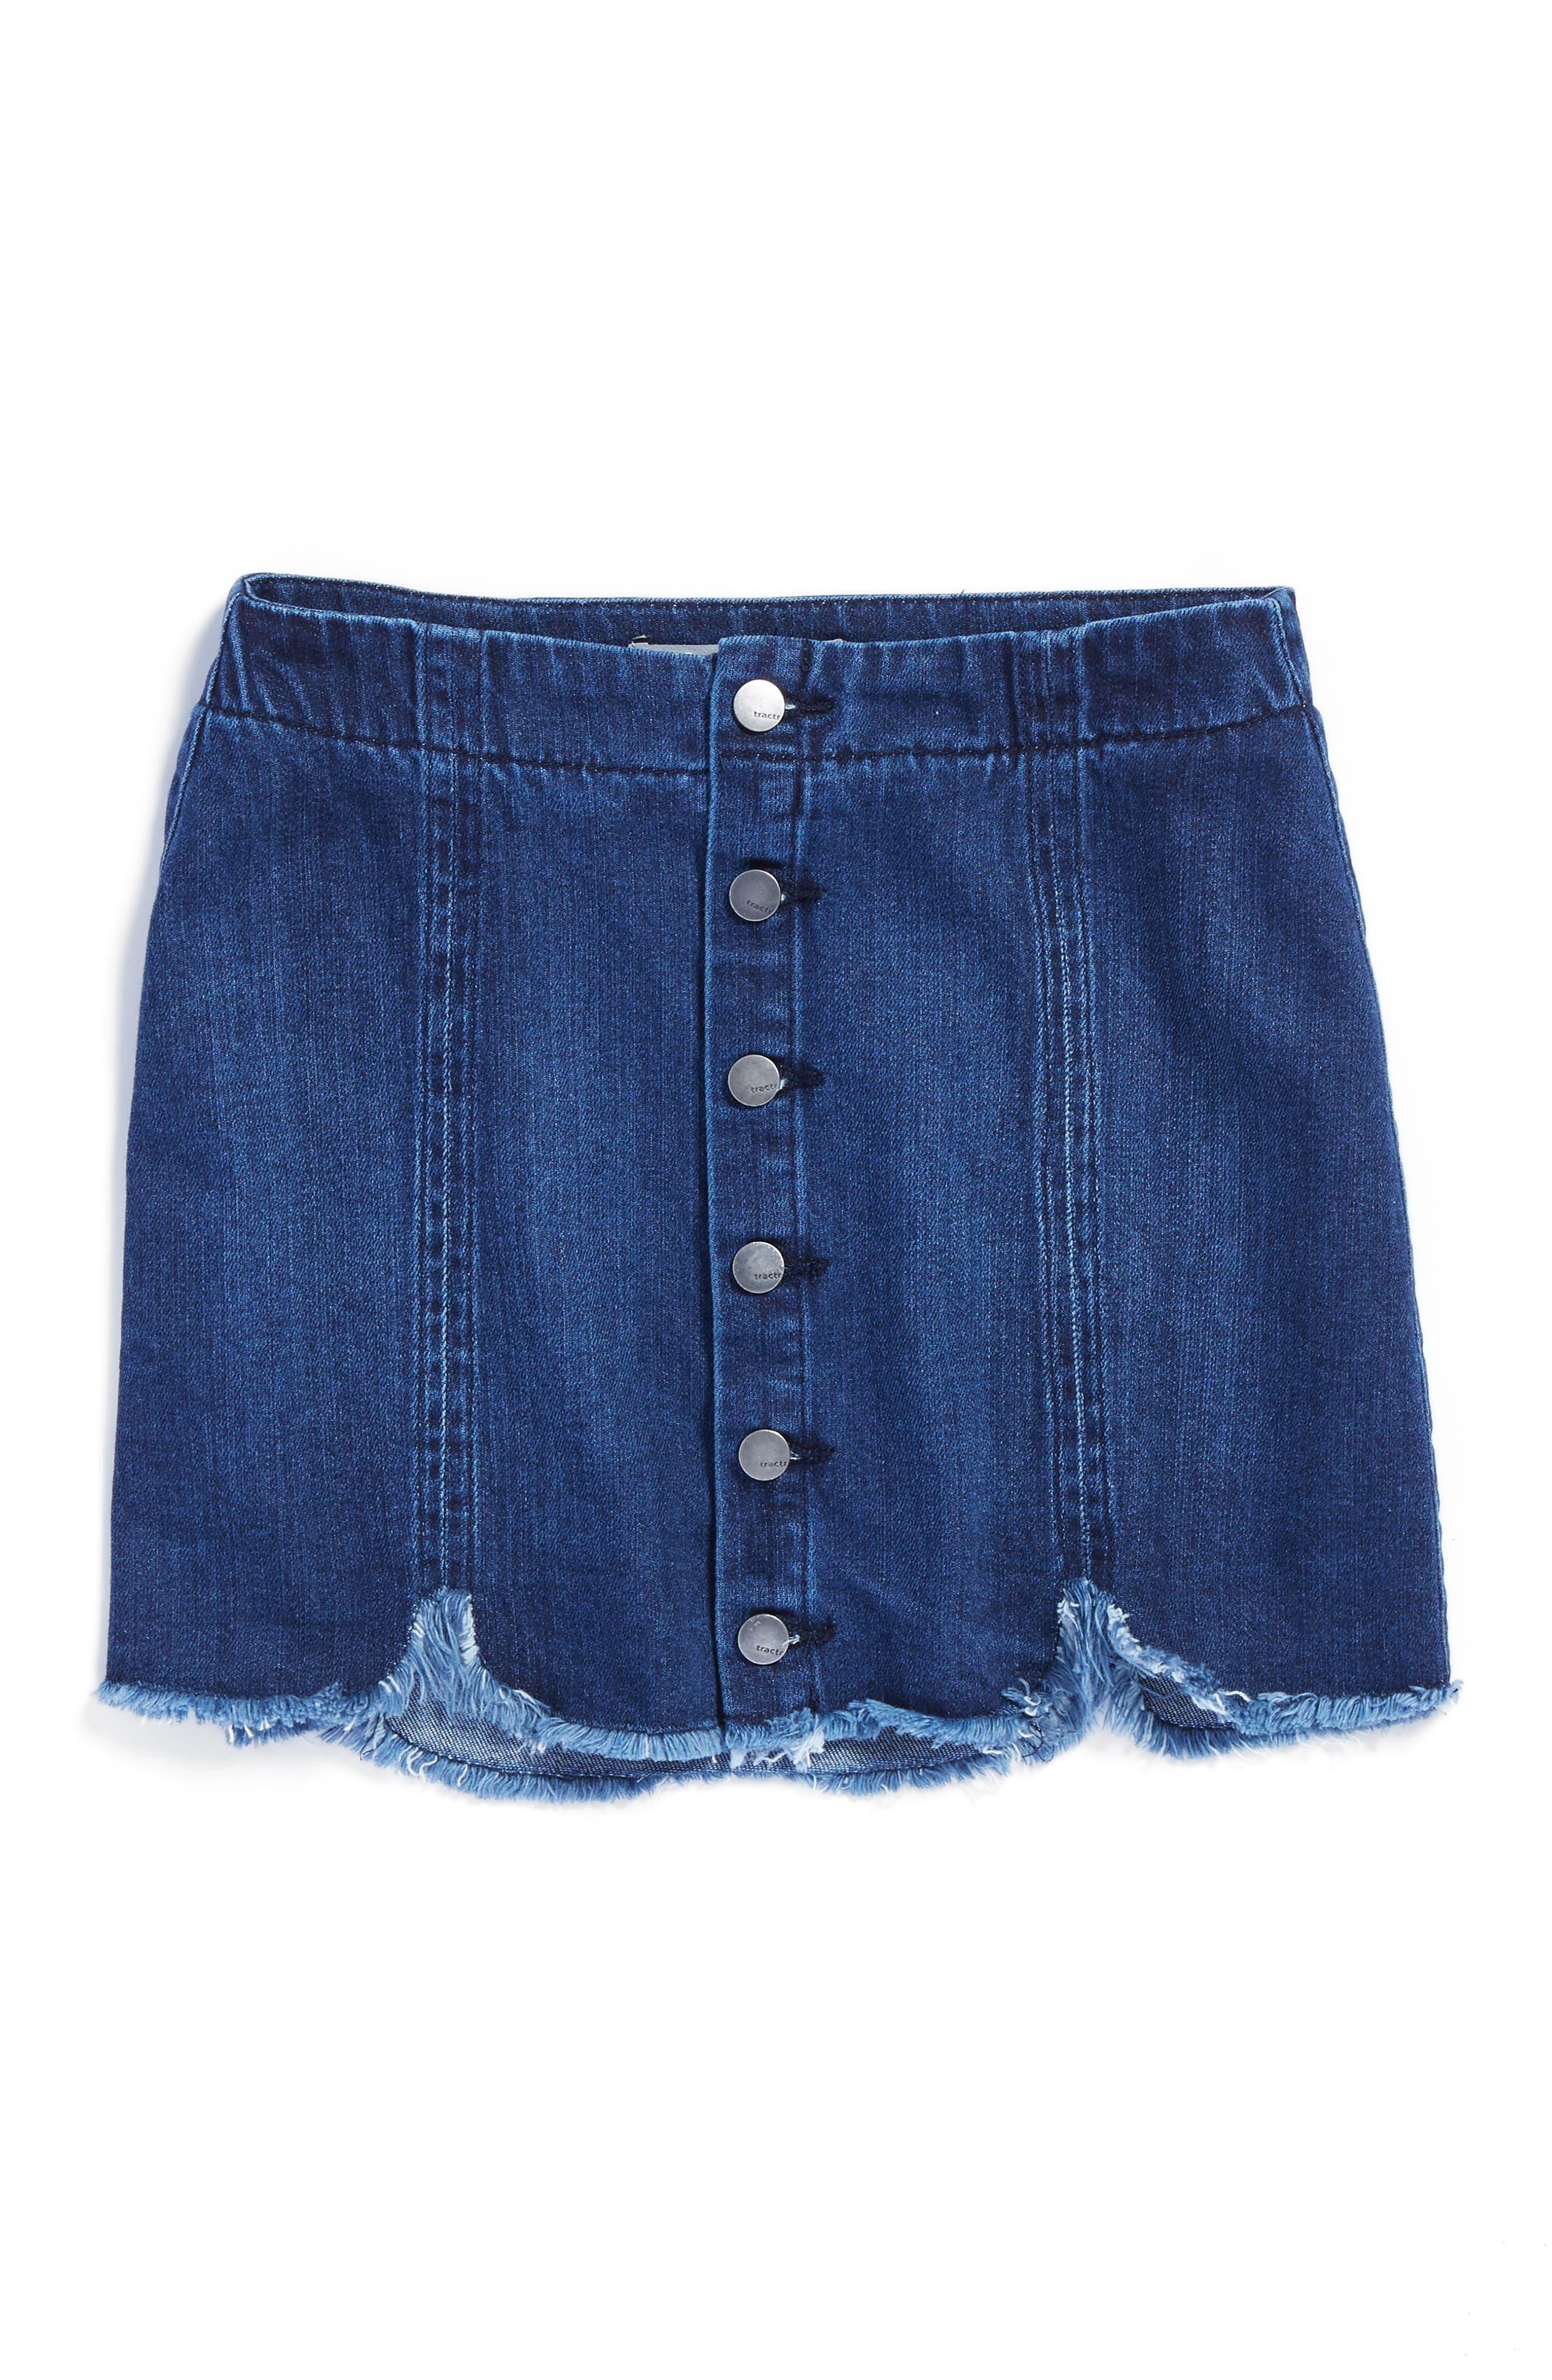 Frayed Scallop Denim Skirt,                         Main,                         color, Indigo